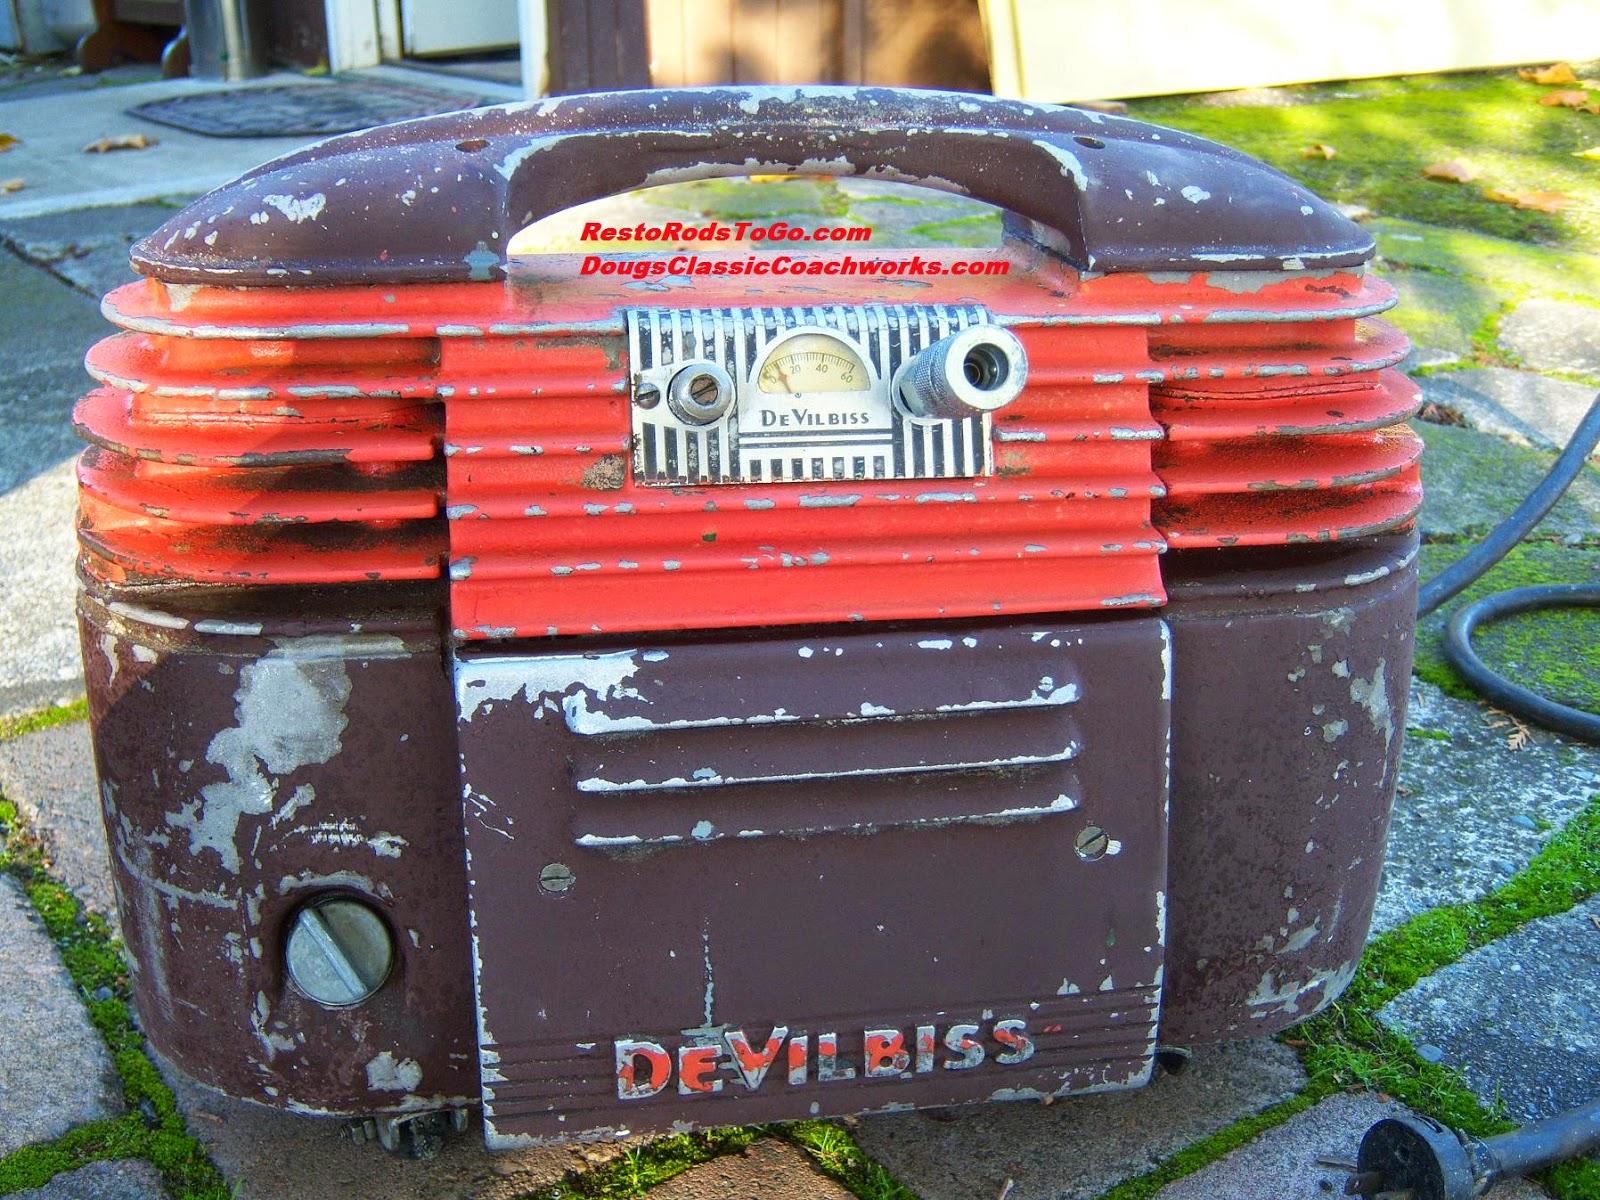 Vintage Art Deco DeVilbiss Air Compressor | Resto Rods To Go